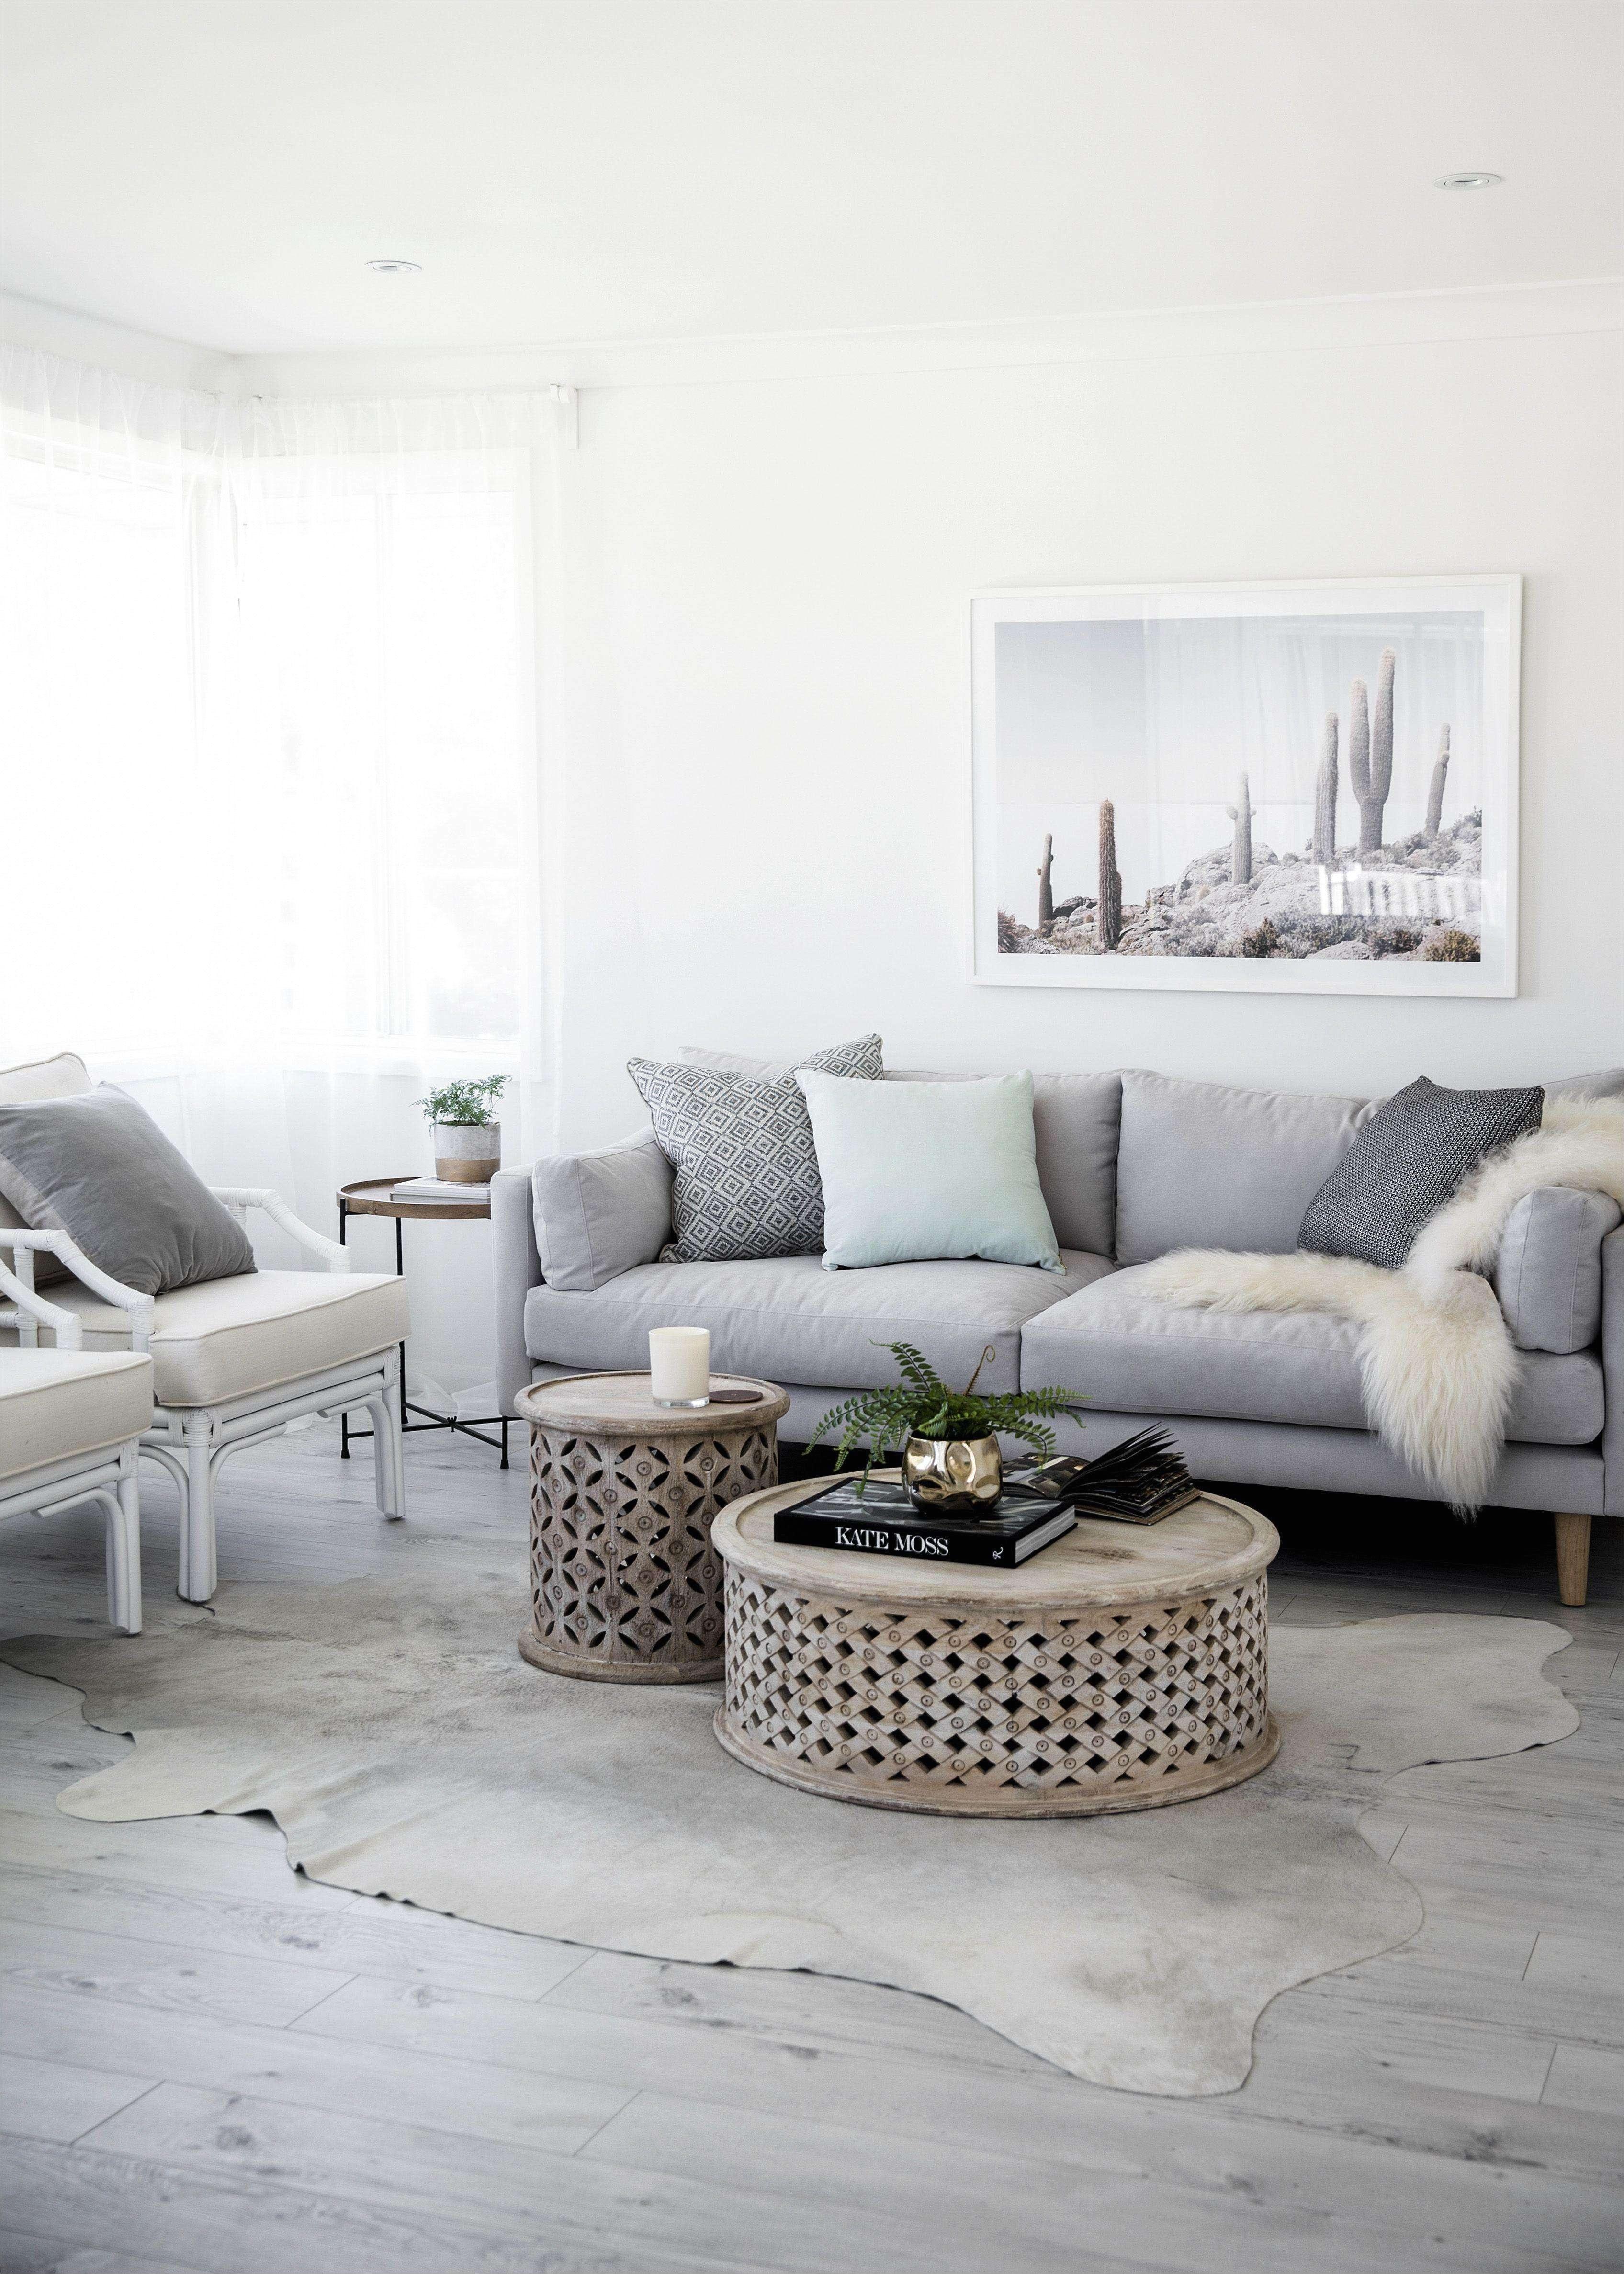 Wooden Center Tables Living Room Living Room and Dining Room Decor Lovely Living Room Center Tables